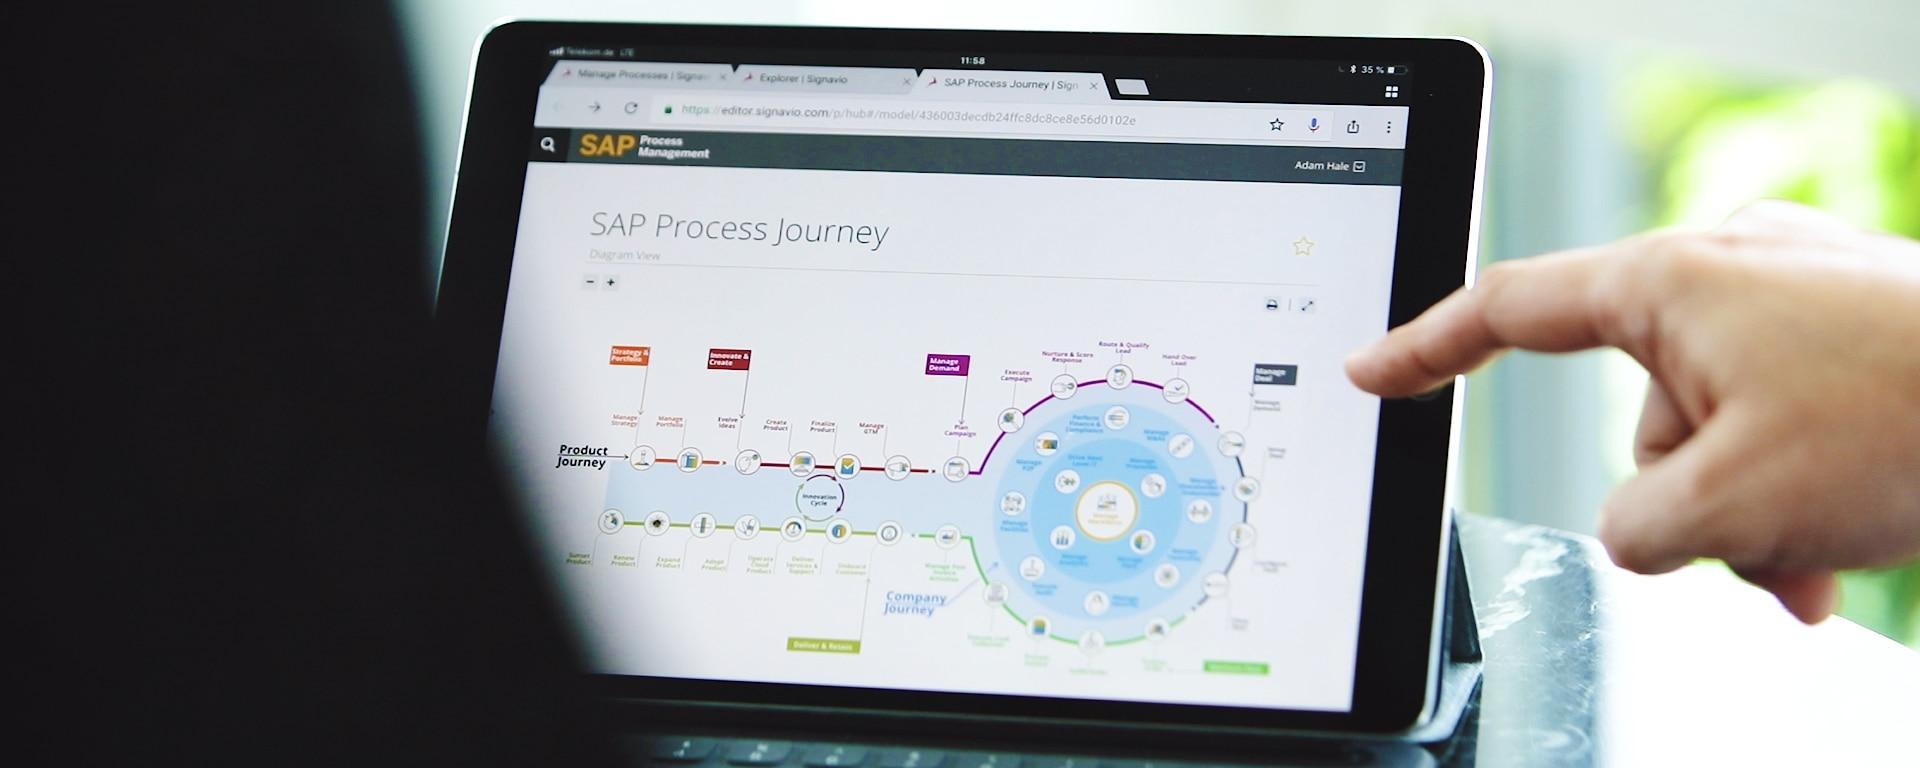 Creating the SAP Process Journey with Signavio | Signavio